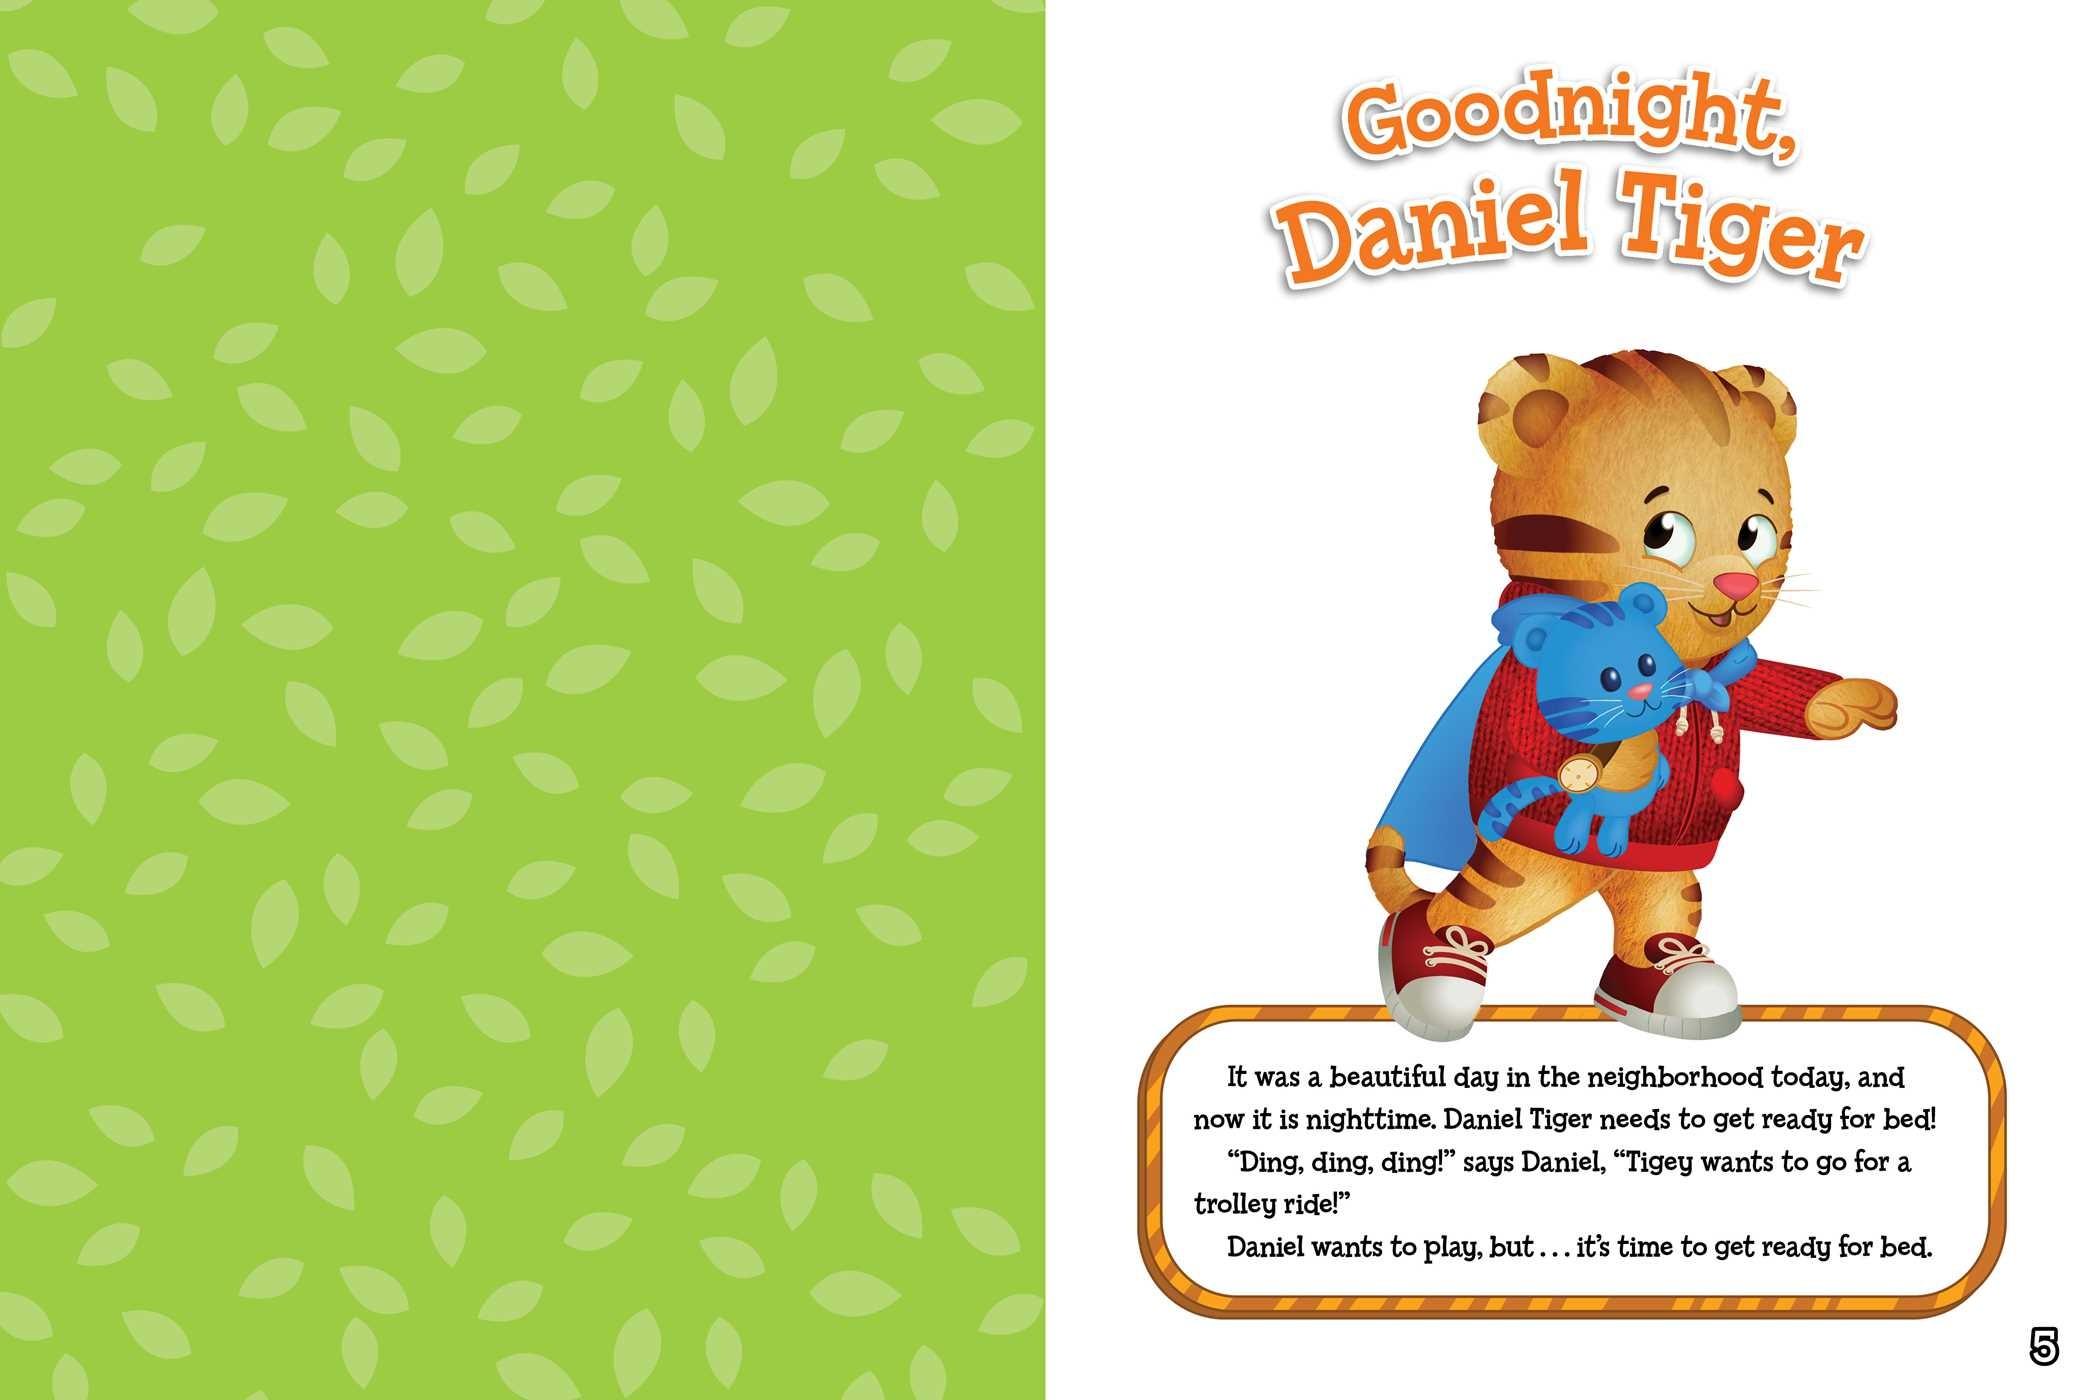 Daniel tigers 5 minute stories 9781481492201.in02